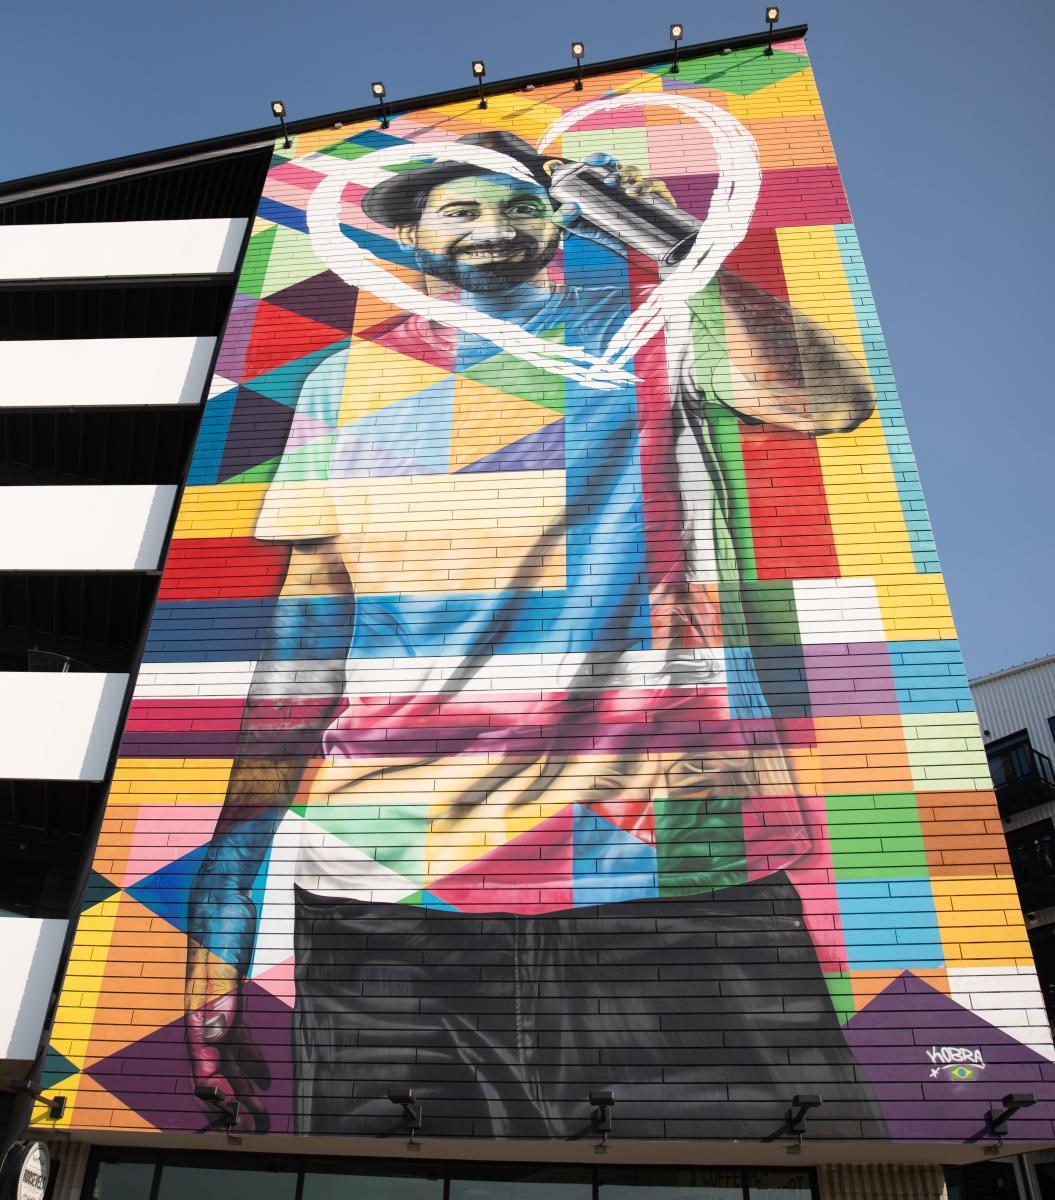 Five-story self-portrat of Eduardo Kobra on the side of Gravity Columbus